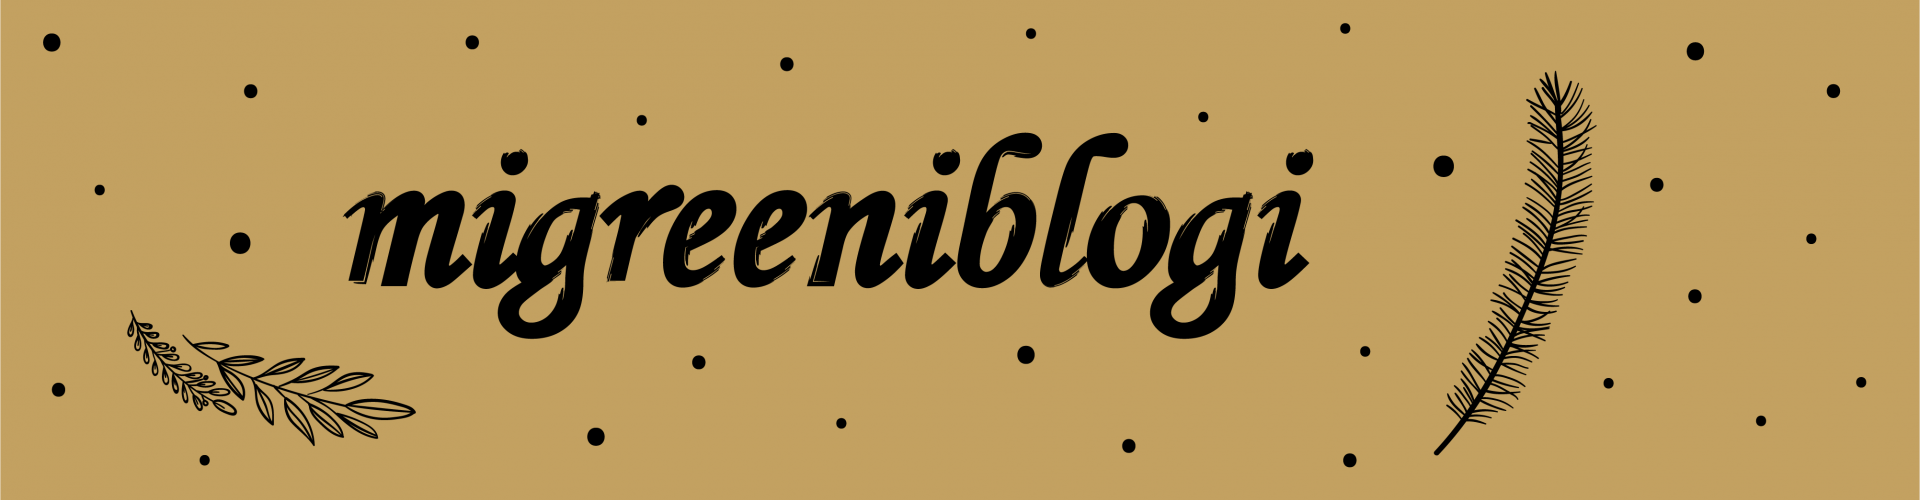 http://www.migreeniblogi.fi/wp-content/uploads/2021/02/cropped-HEADER2.png